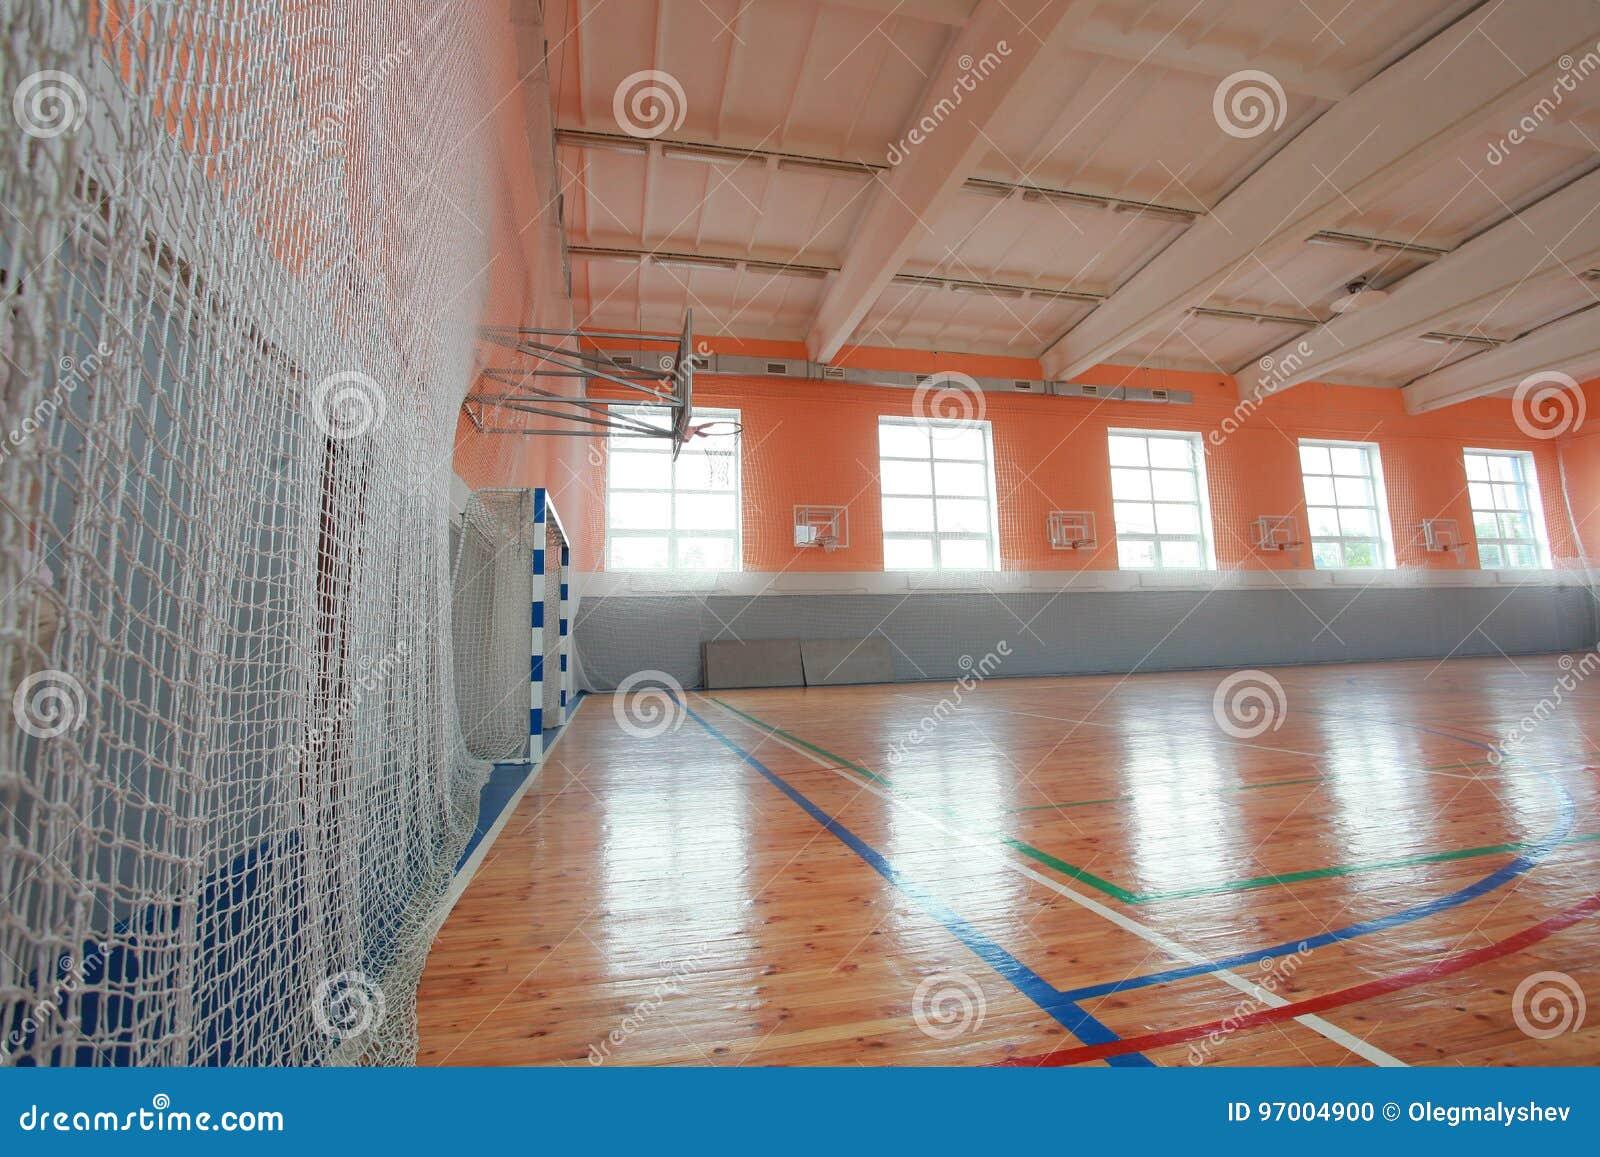 Basketball hall indoor court wood floor